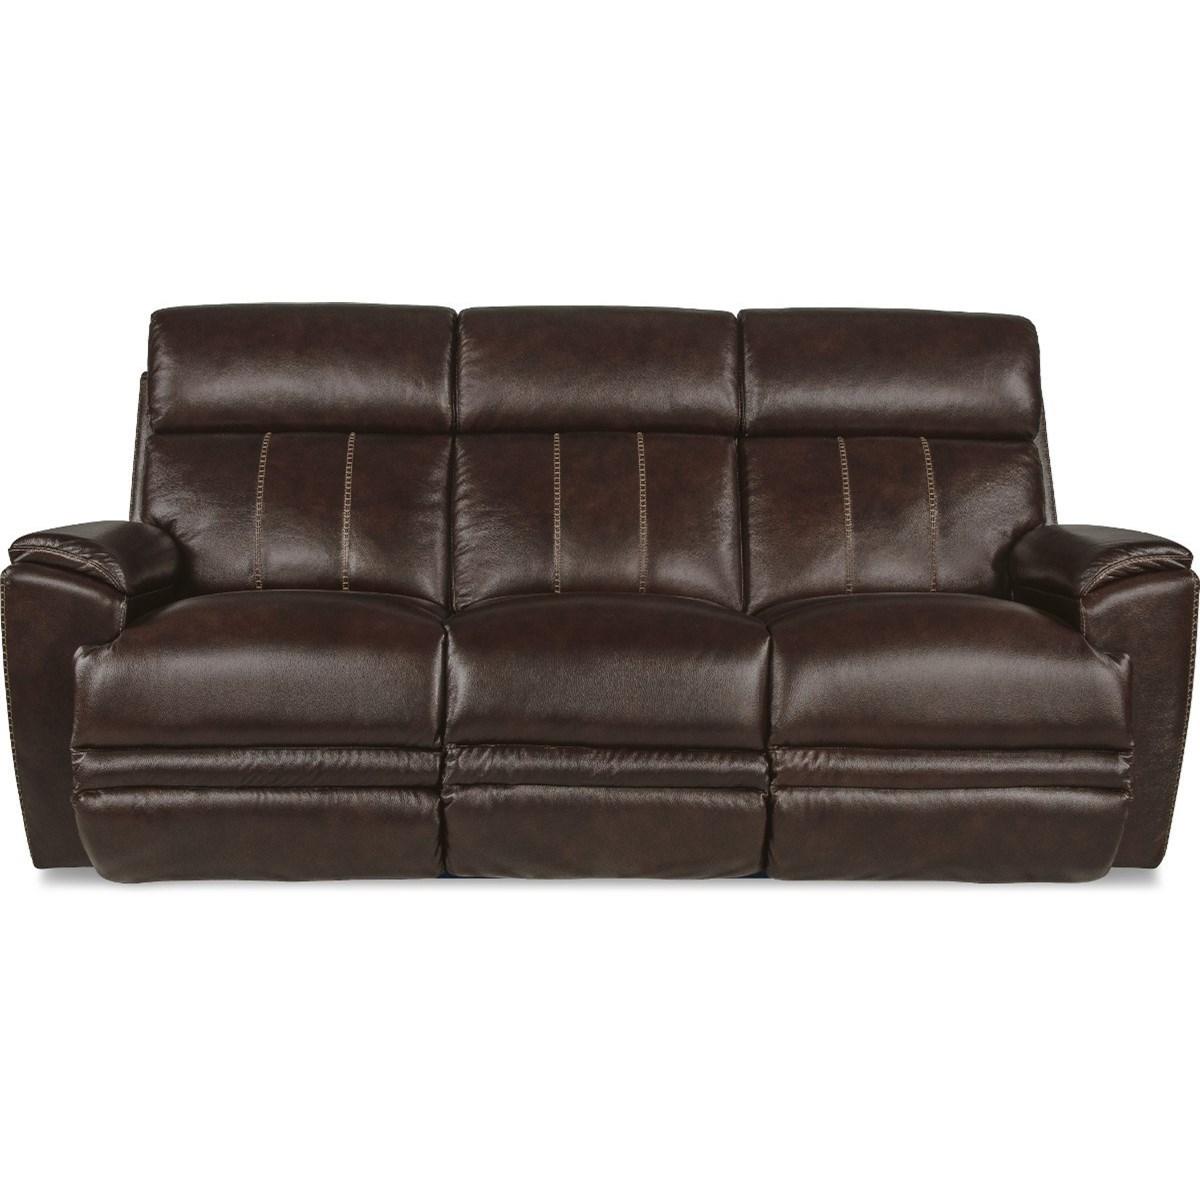 Talladega Power Reclining Sofa w/ Headrests by La-Z-Boy at Jordan's Home Furnishings